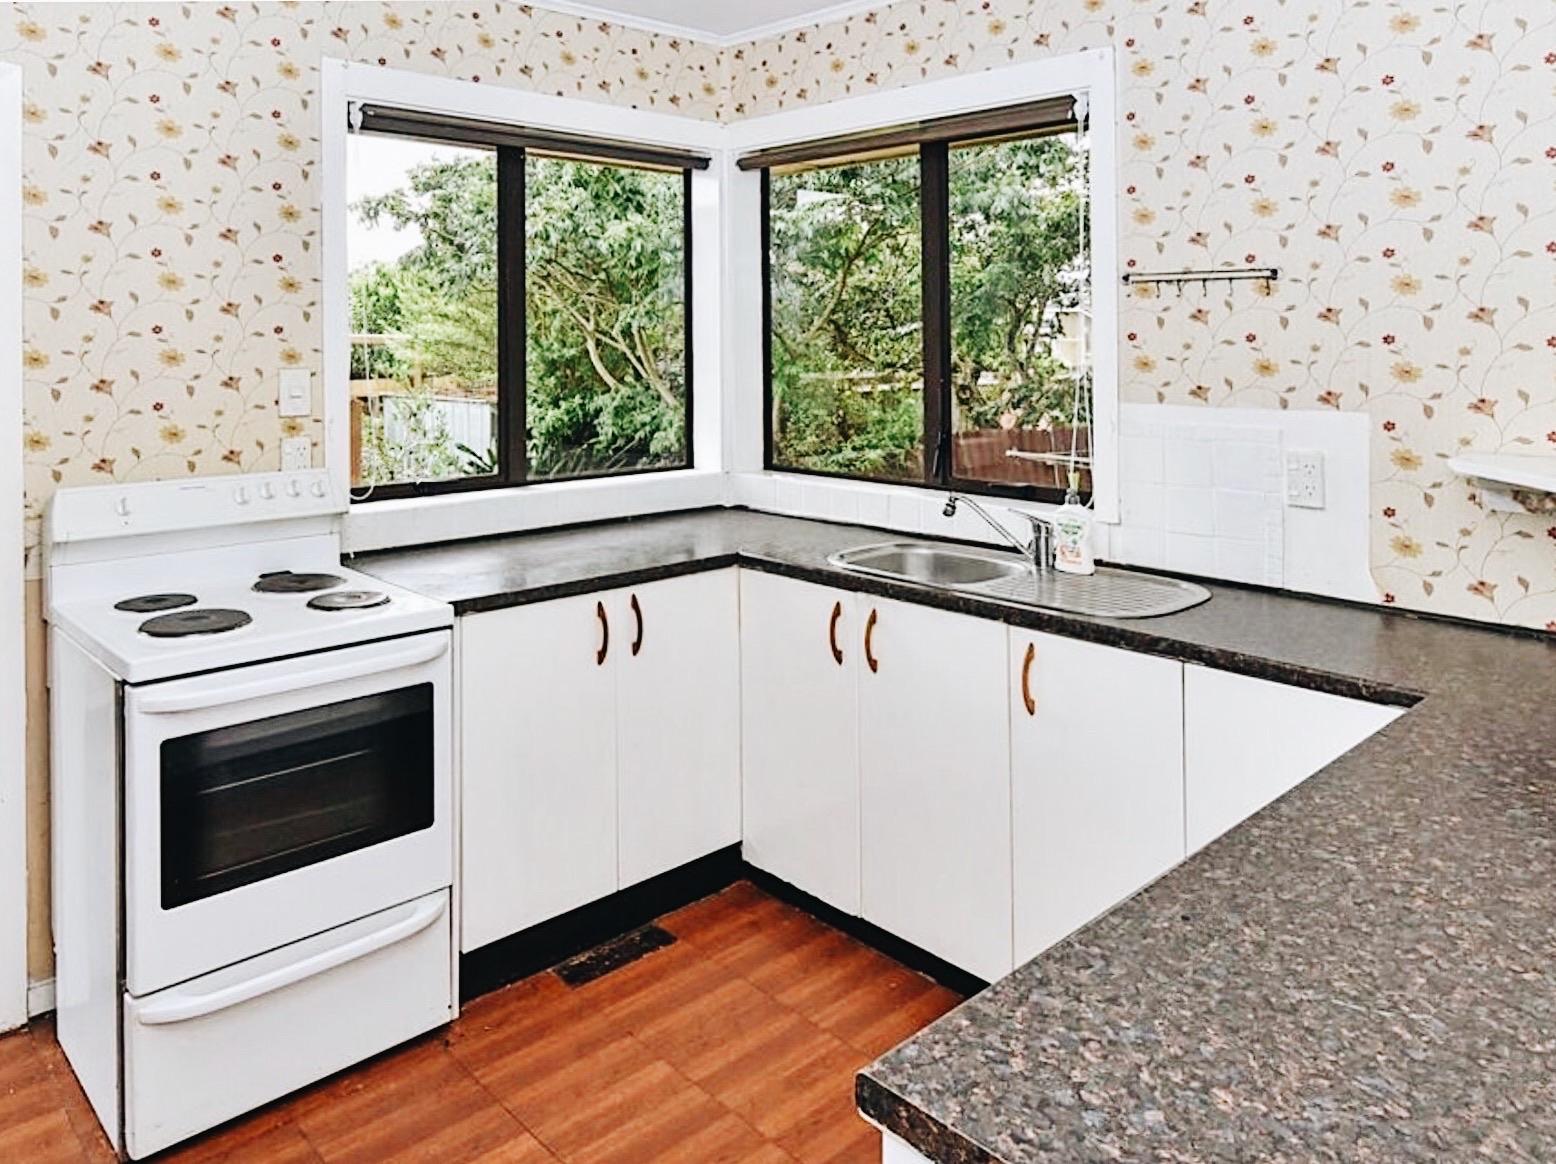 Kitchen Mania Takeover - 1.jpg